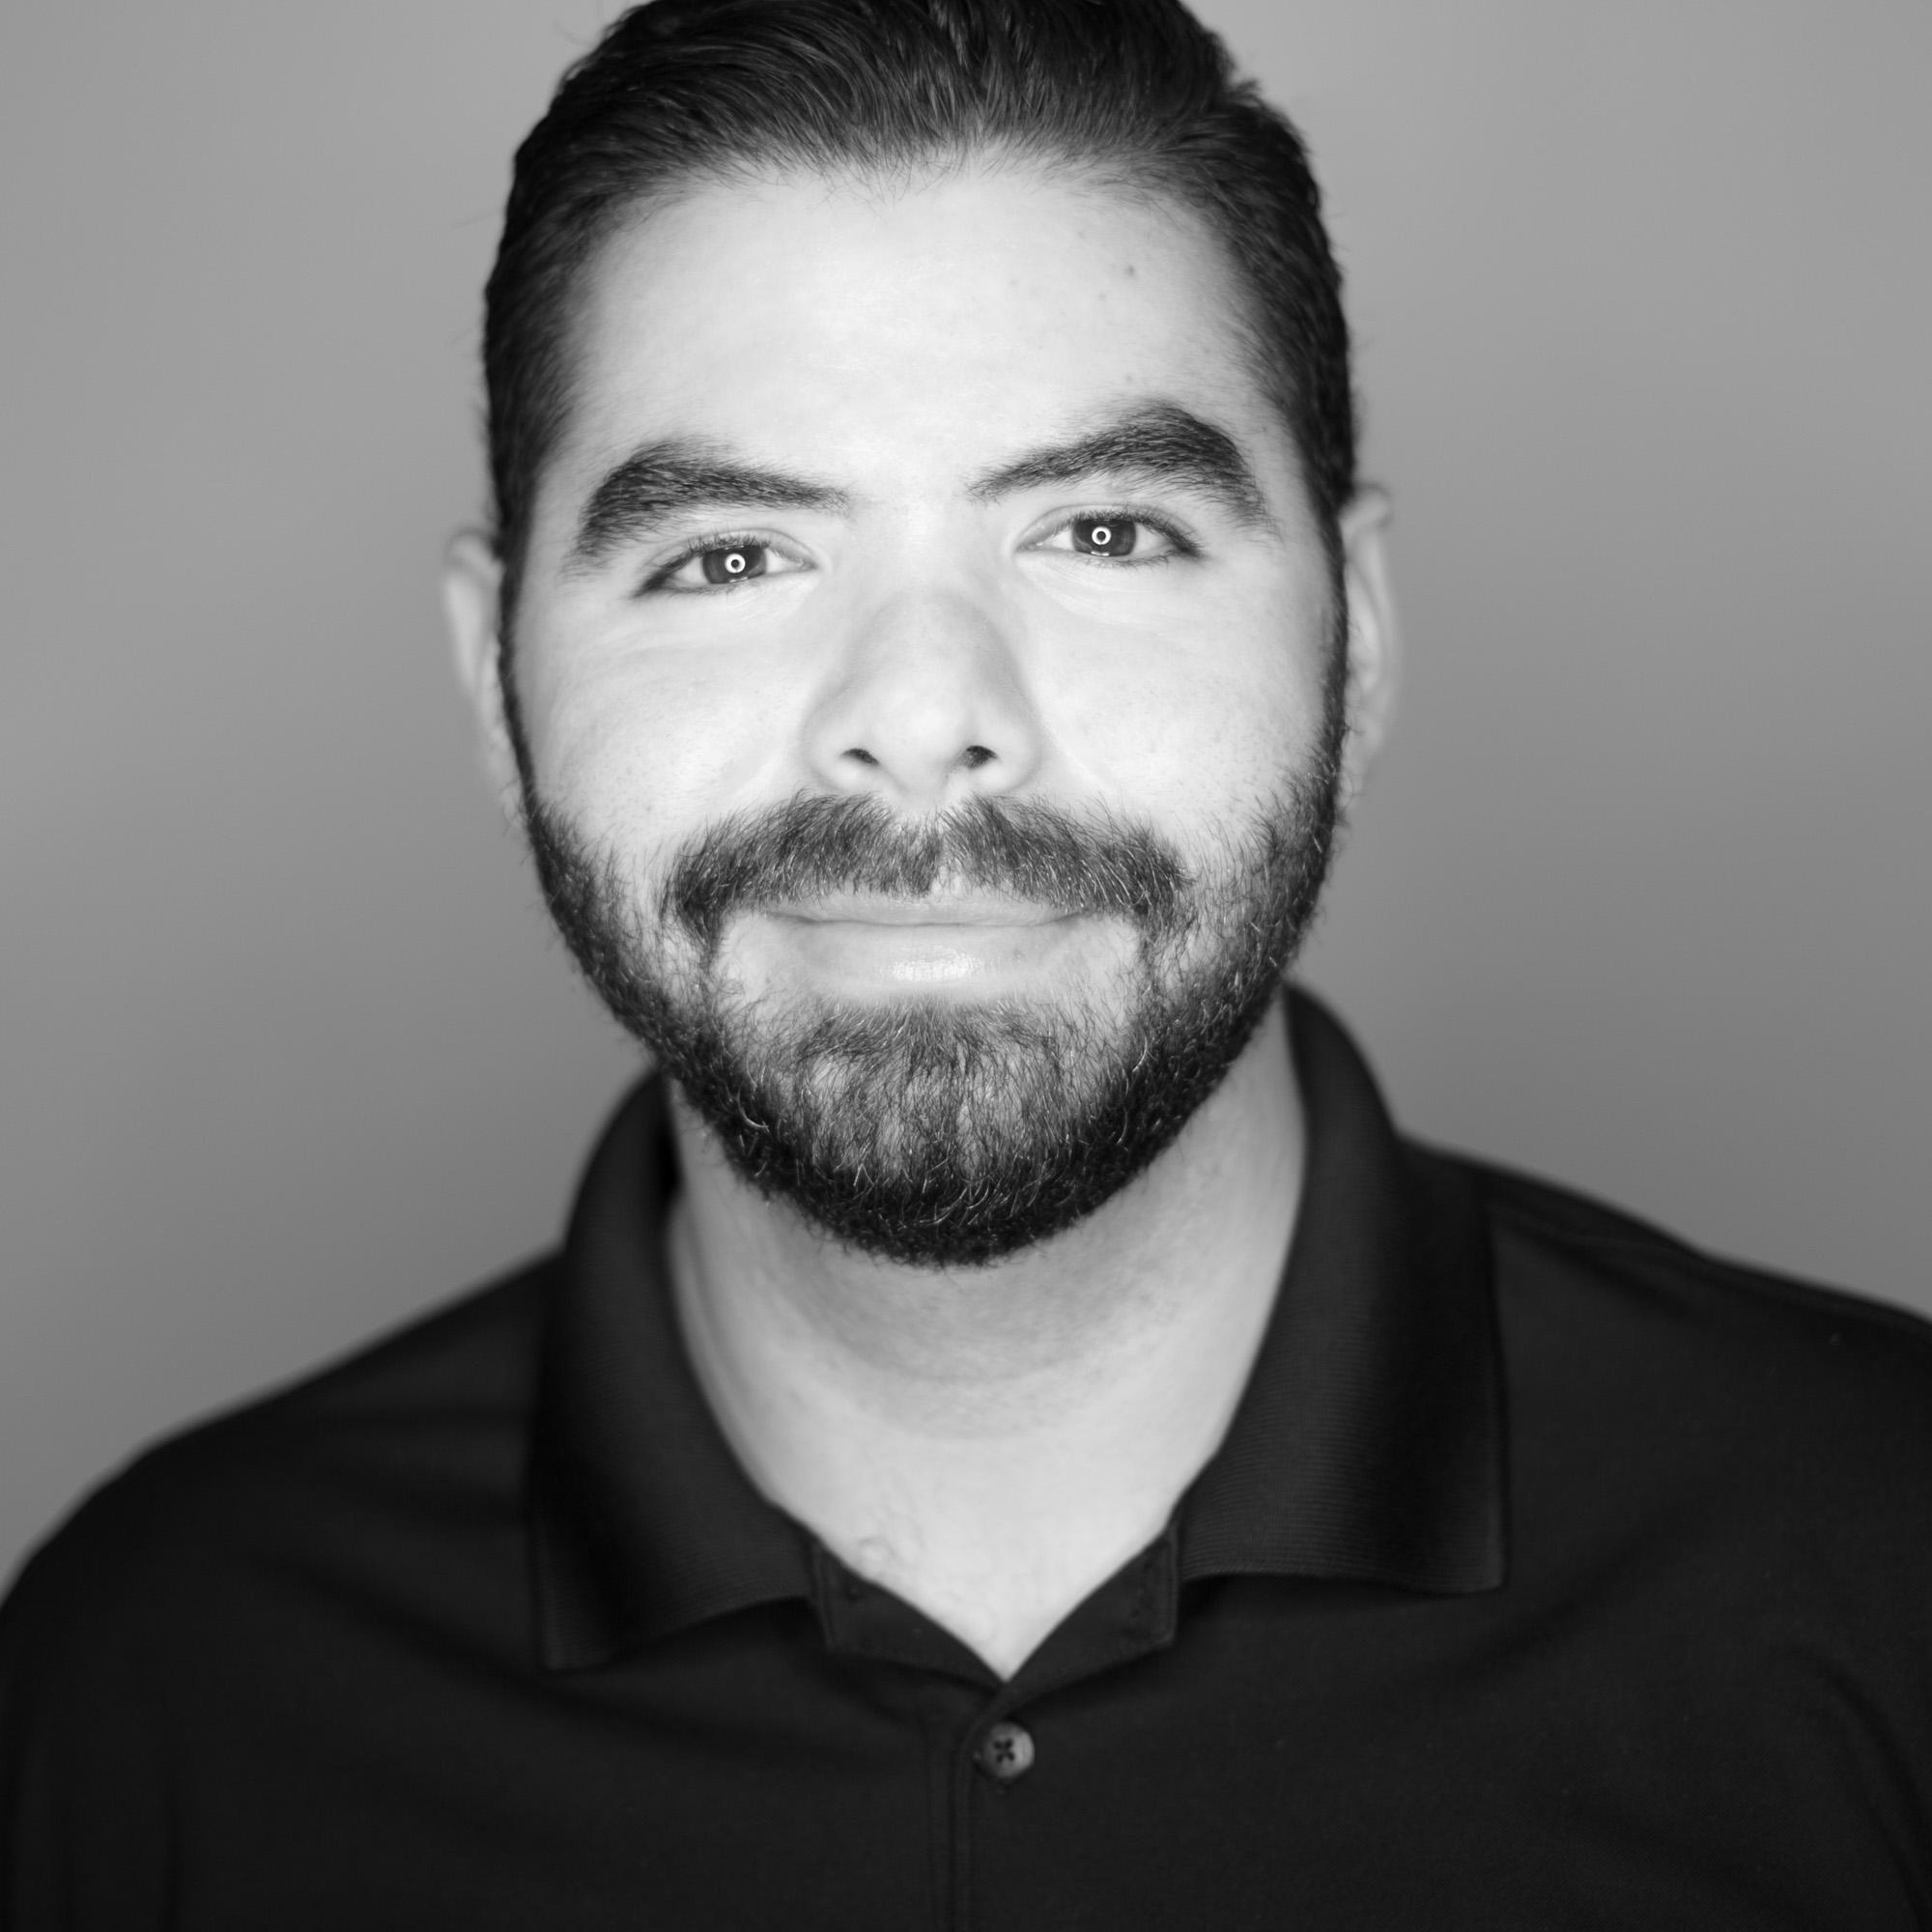 RICARDO MALDONADO - Producer